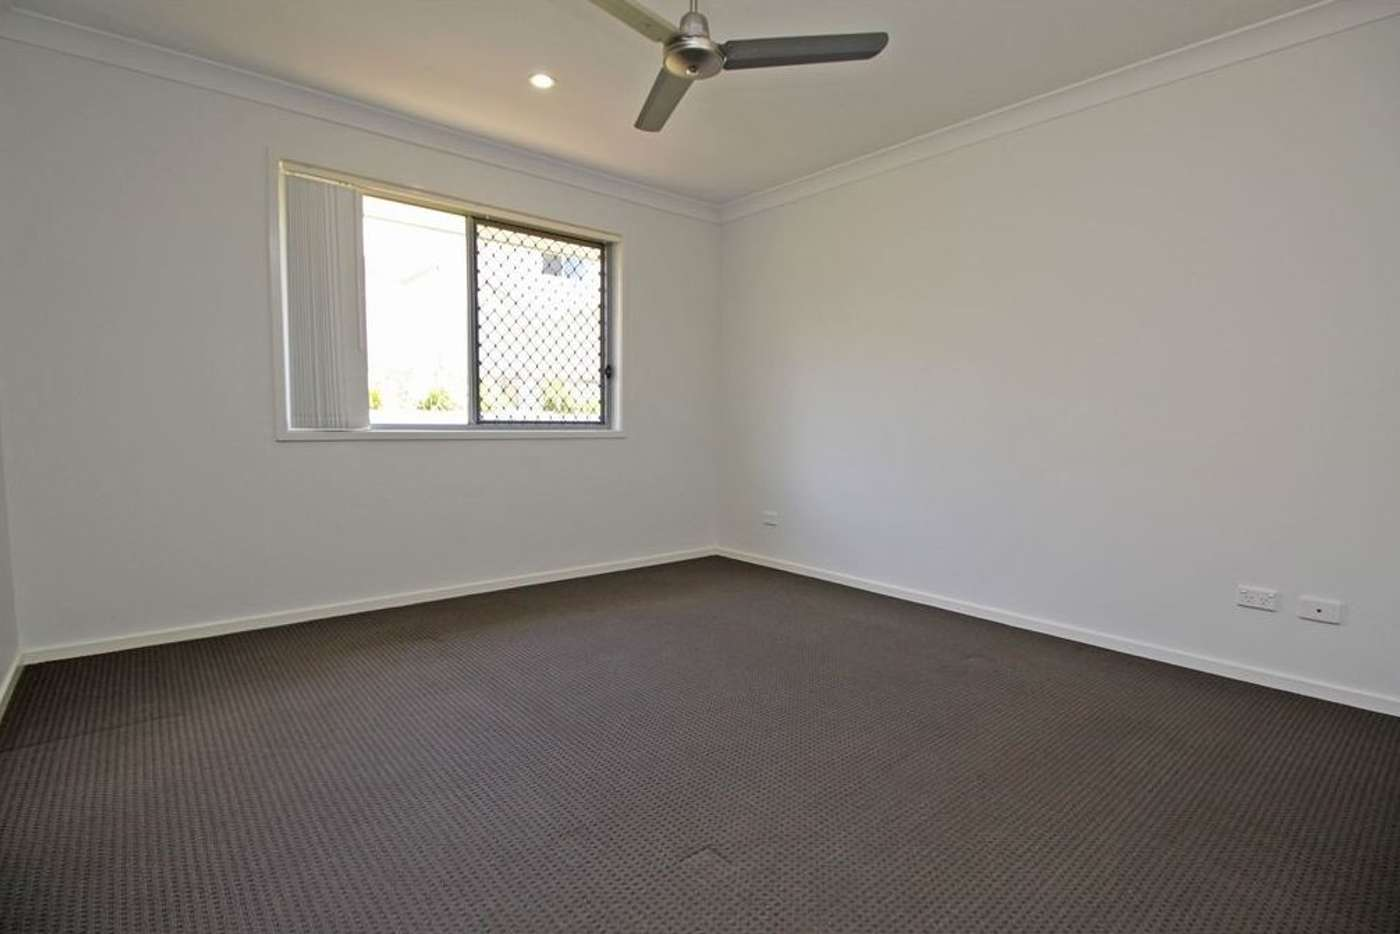 Seventh view of Homely house listing, 8 Denman Drive, Bundamba QLD 4304